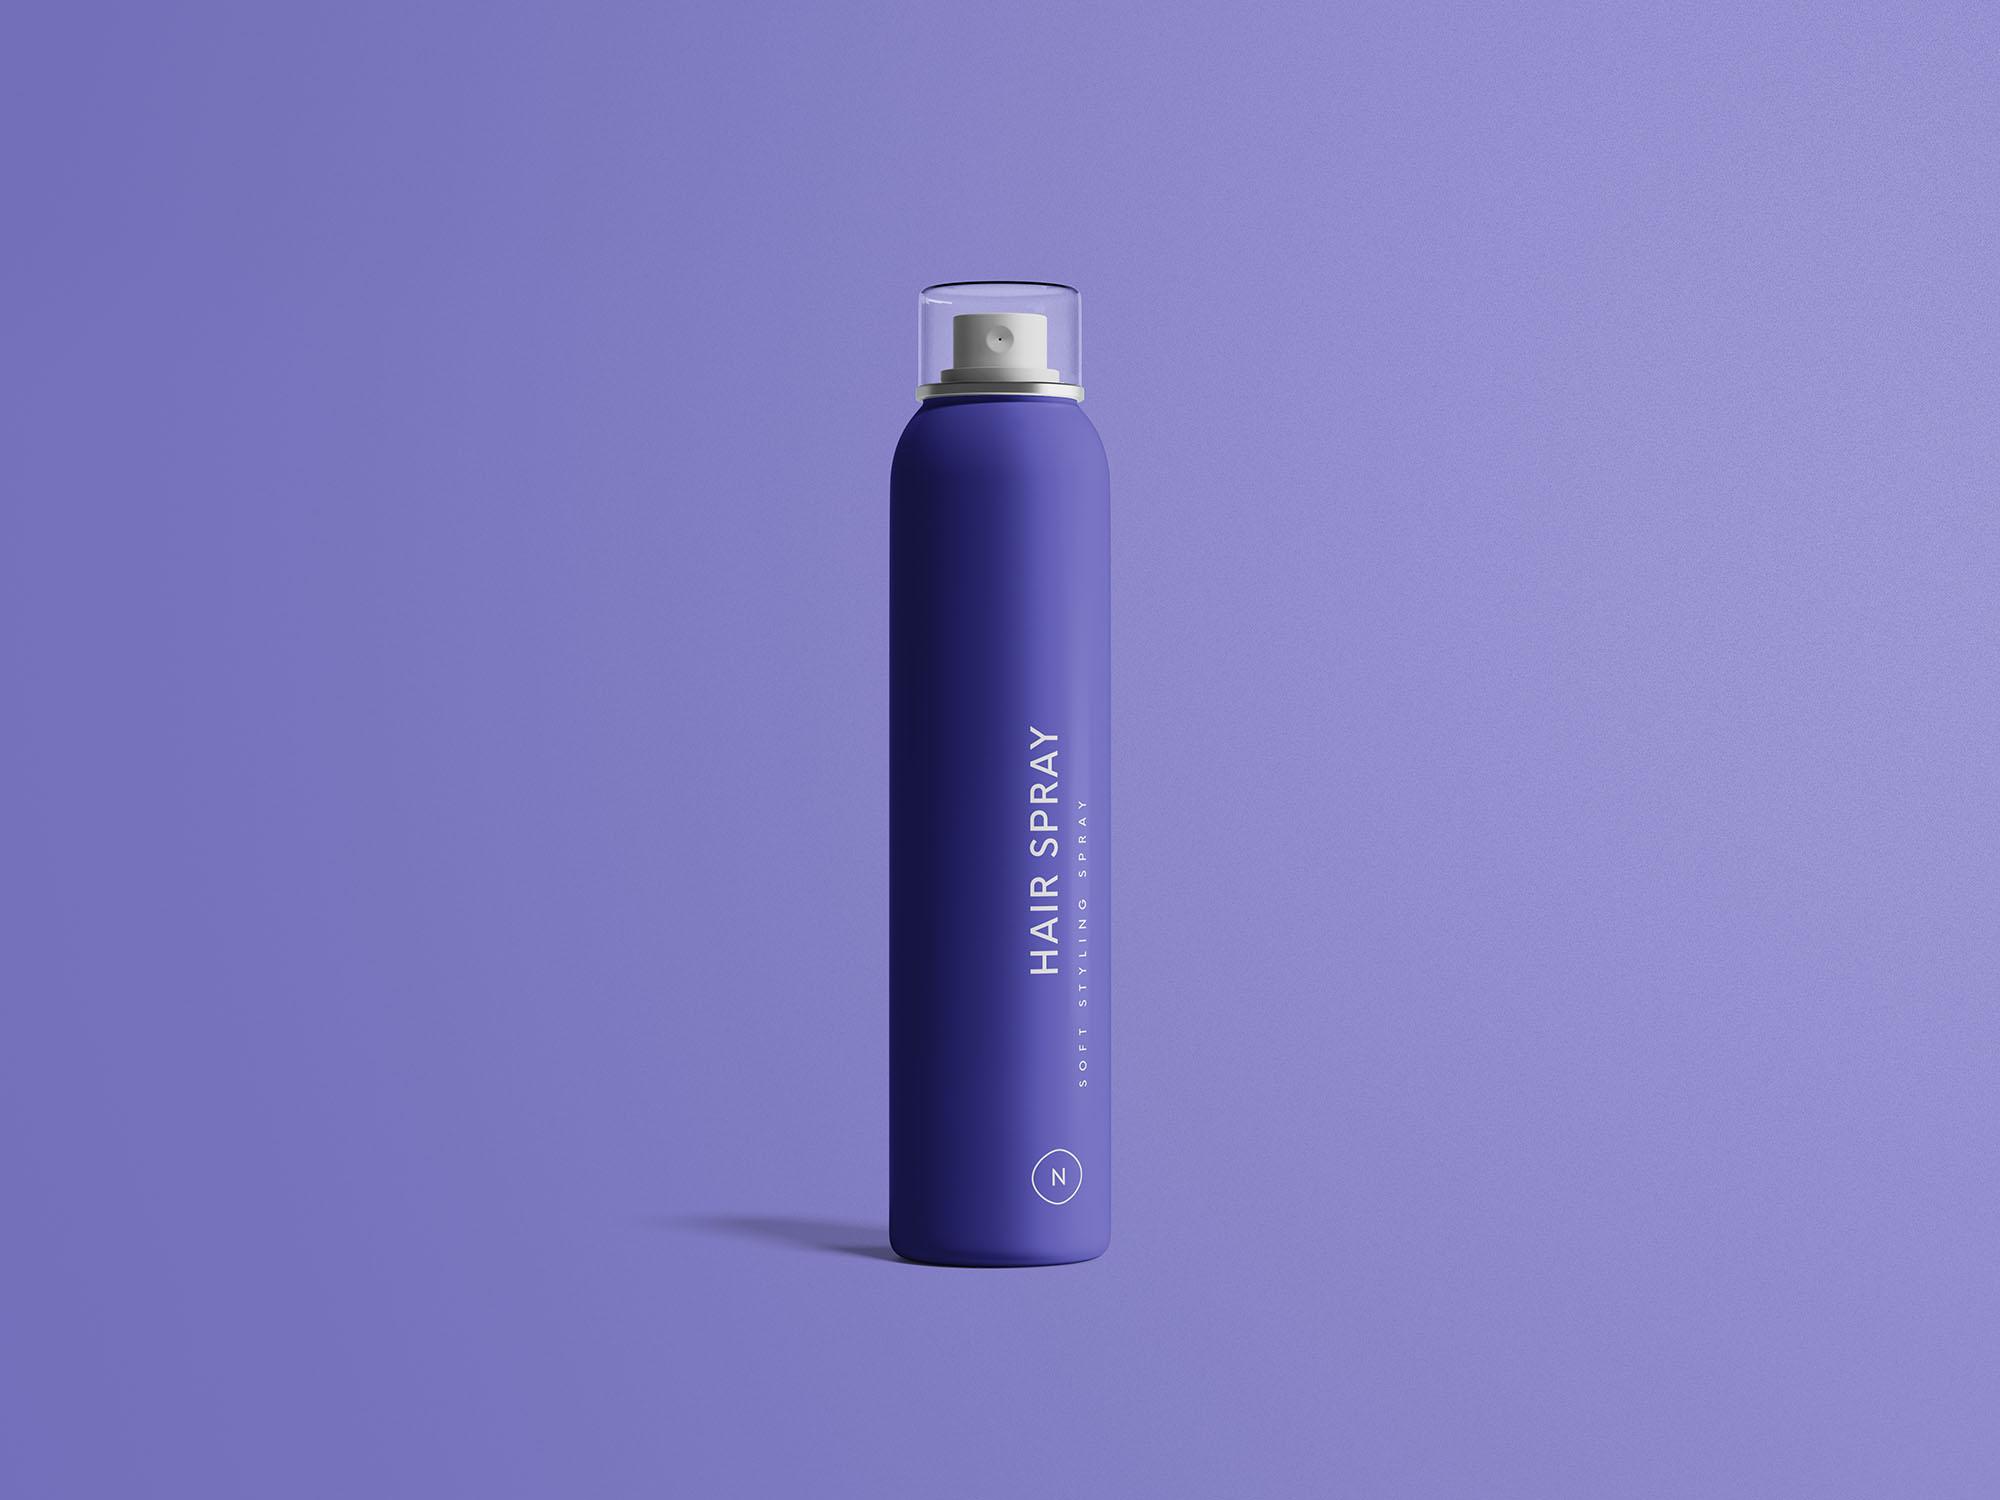 Hair Spray Mockup Free PSD Template